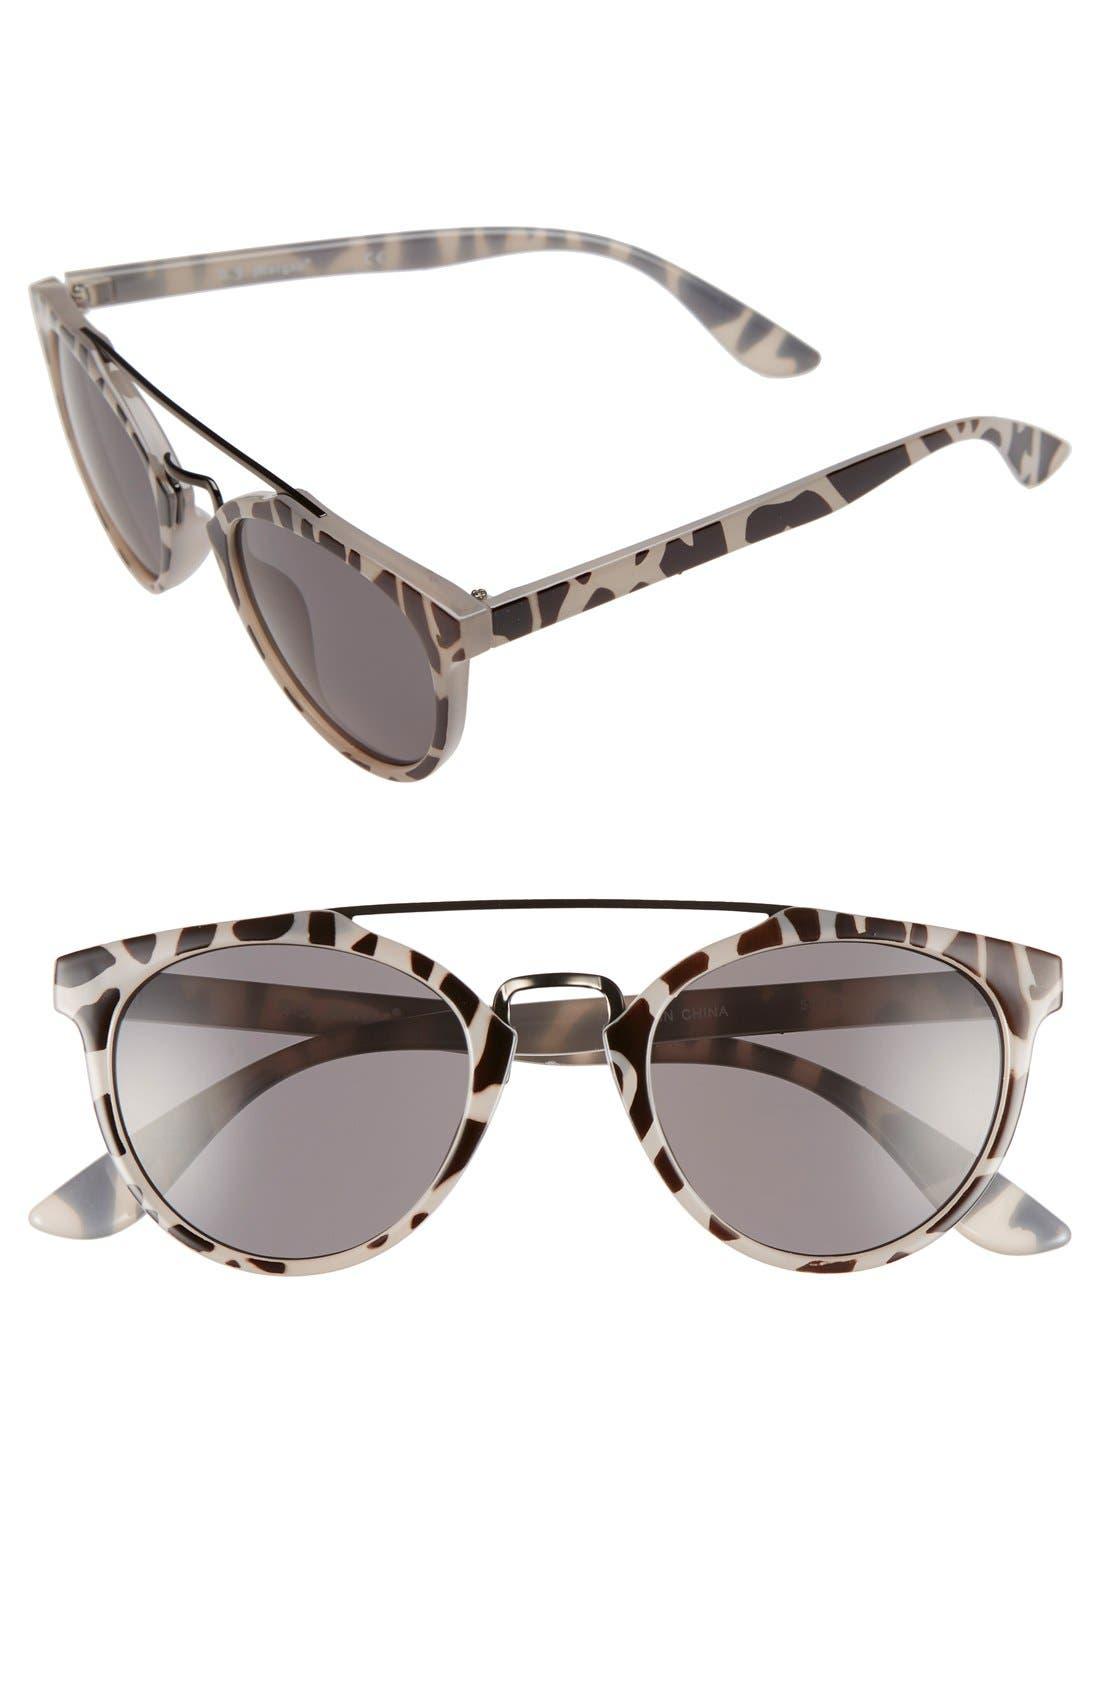 Main Image - A.J. Morgan 'Coco' 49mm Sunglasses